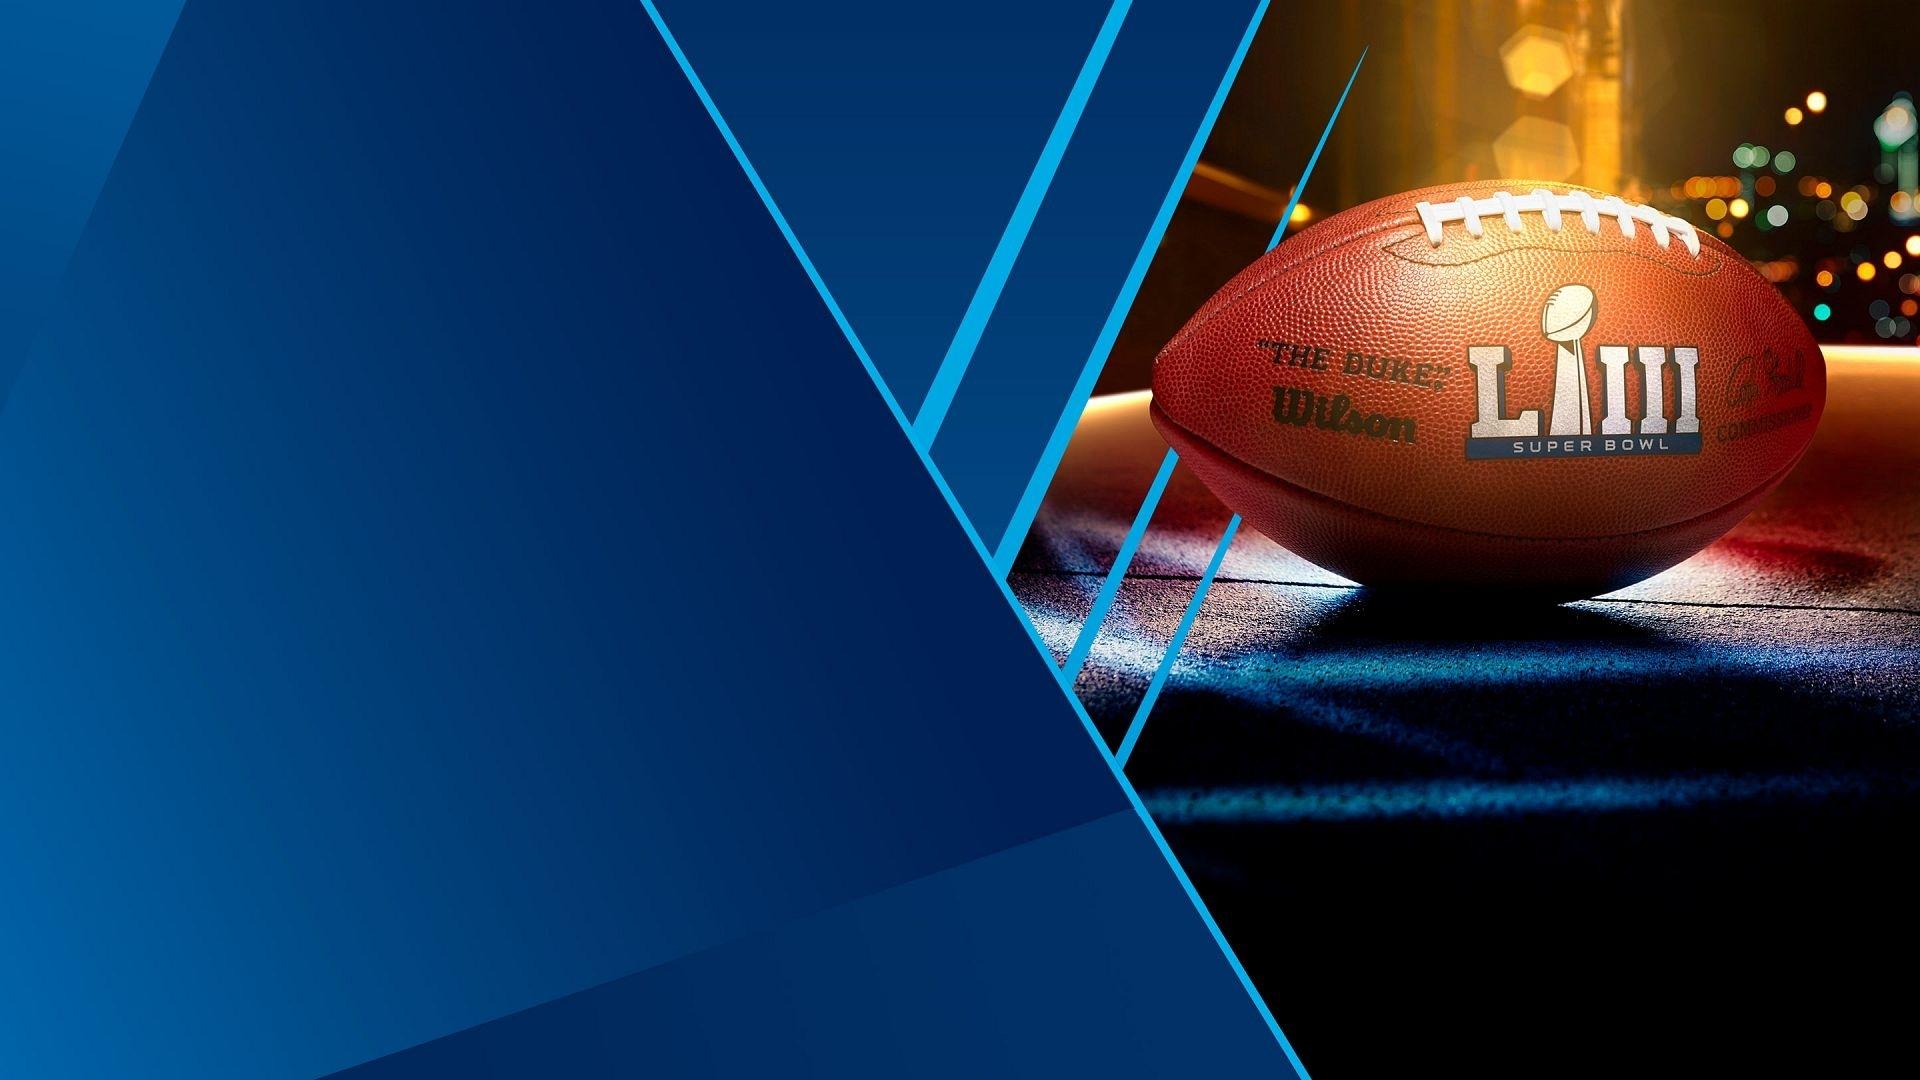 Watch Super Bowl 2019 - Live Stream Rams Vs Patriots Online regarding Super Bowl 2019 Online